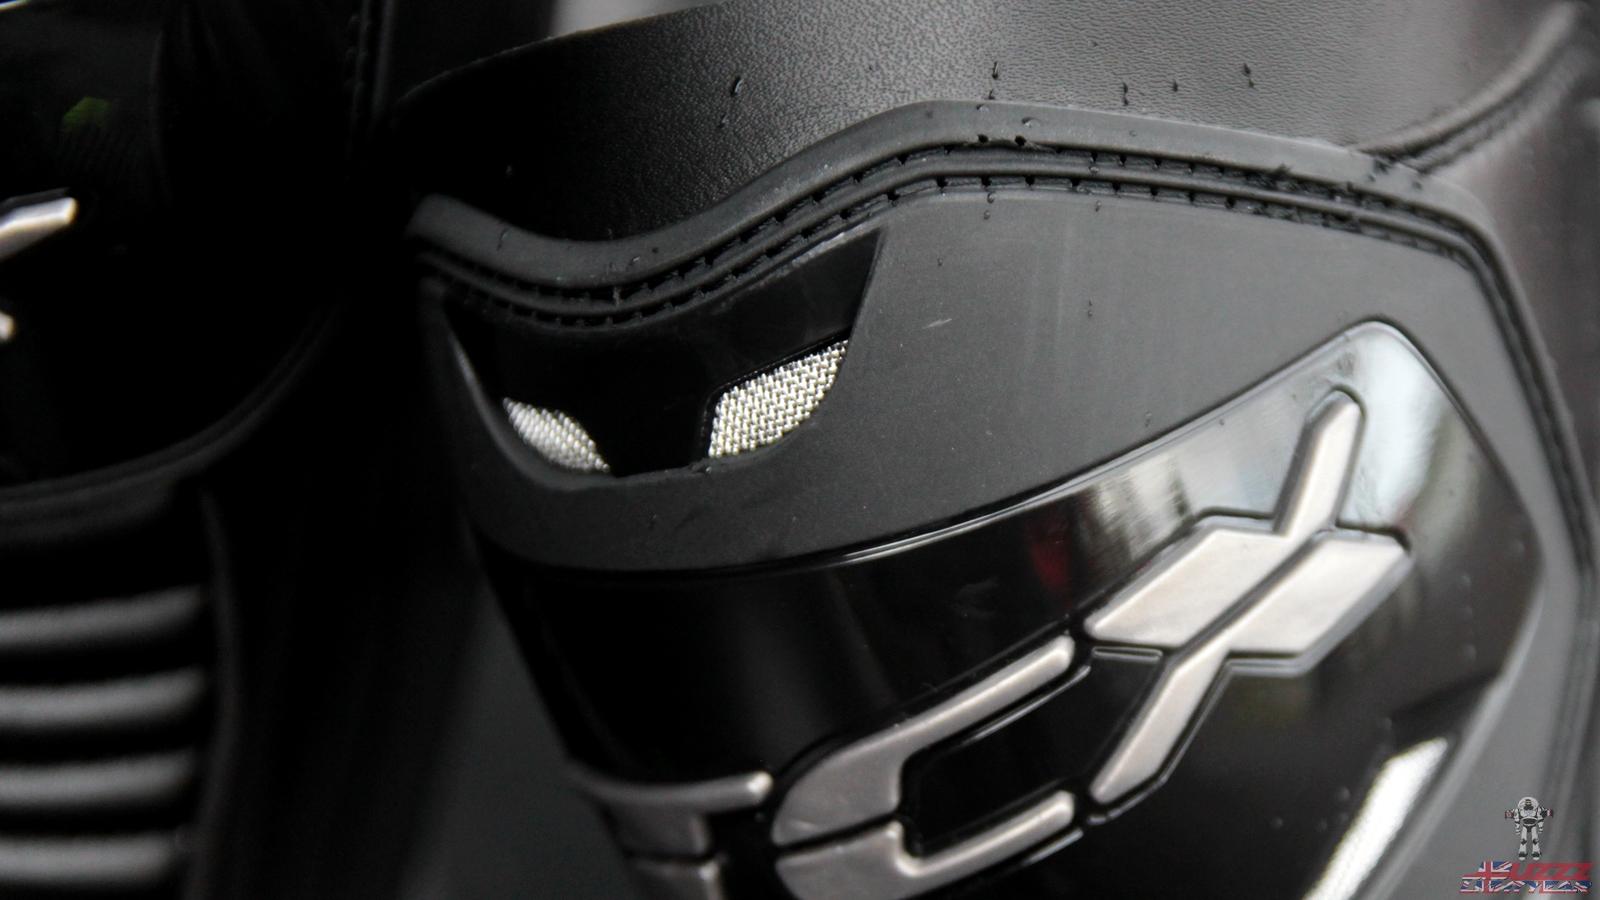 Prueba: Botas para moto TCX SP Master Gore Tex